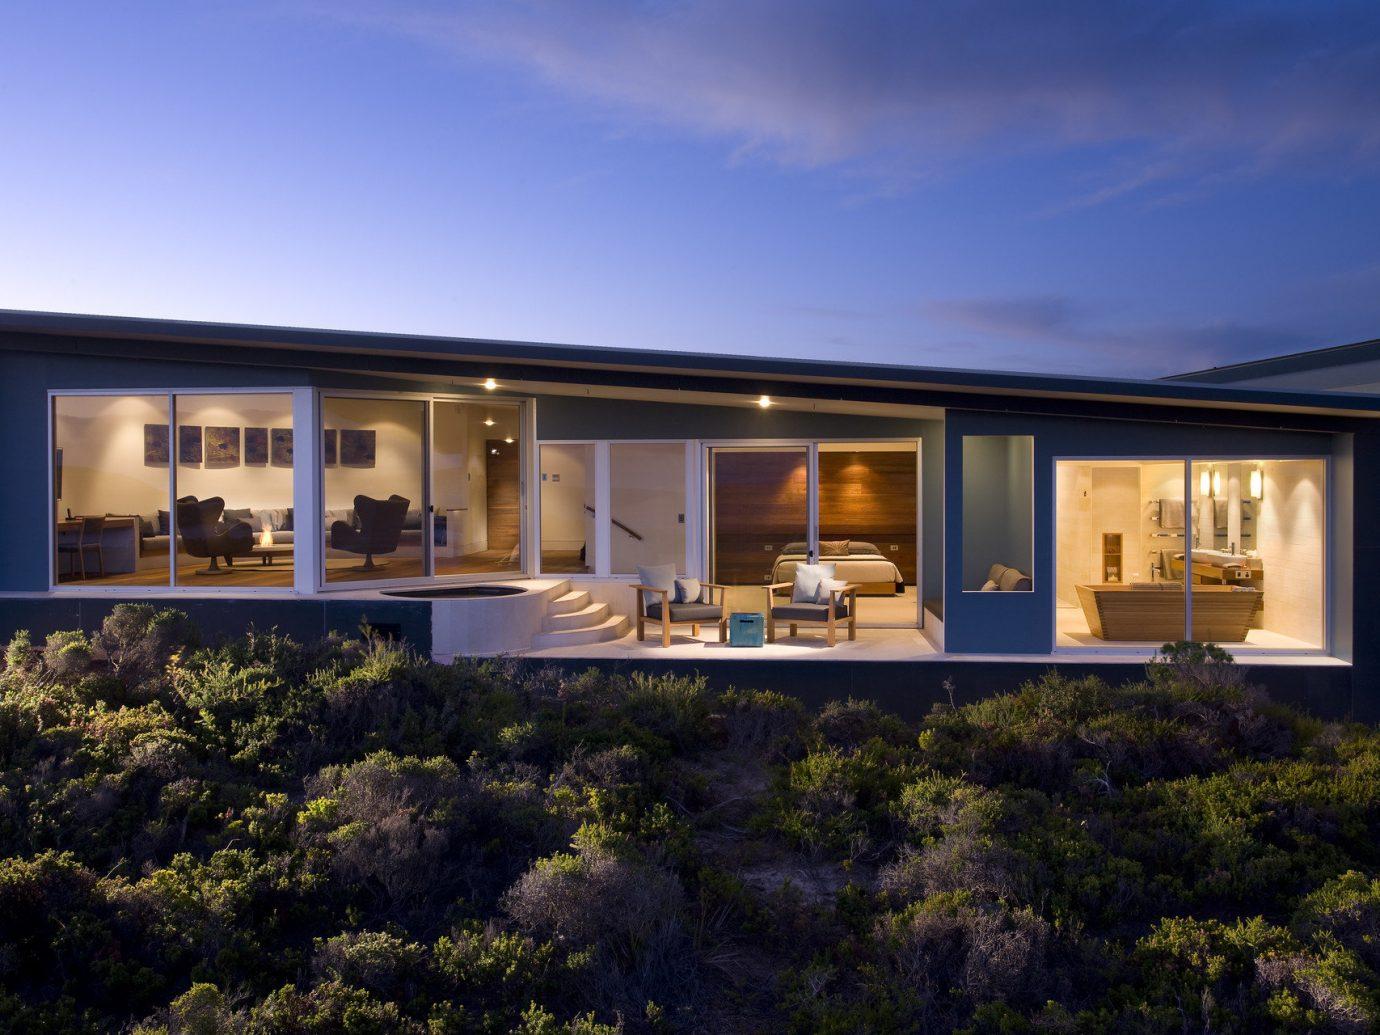 Hotels house property home outdoor estate Architecture facade real estate professional residential area condominium Design Villa mansion